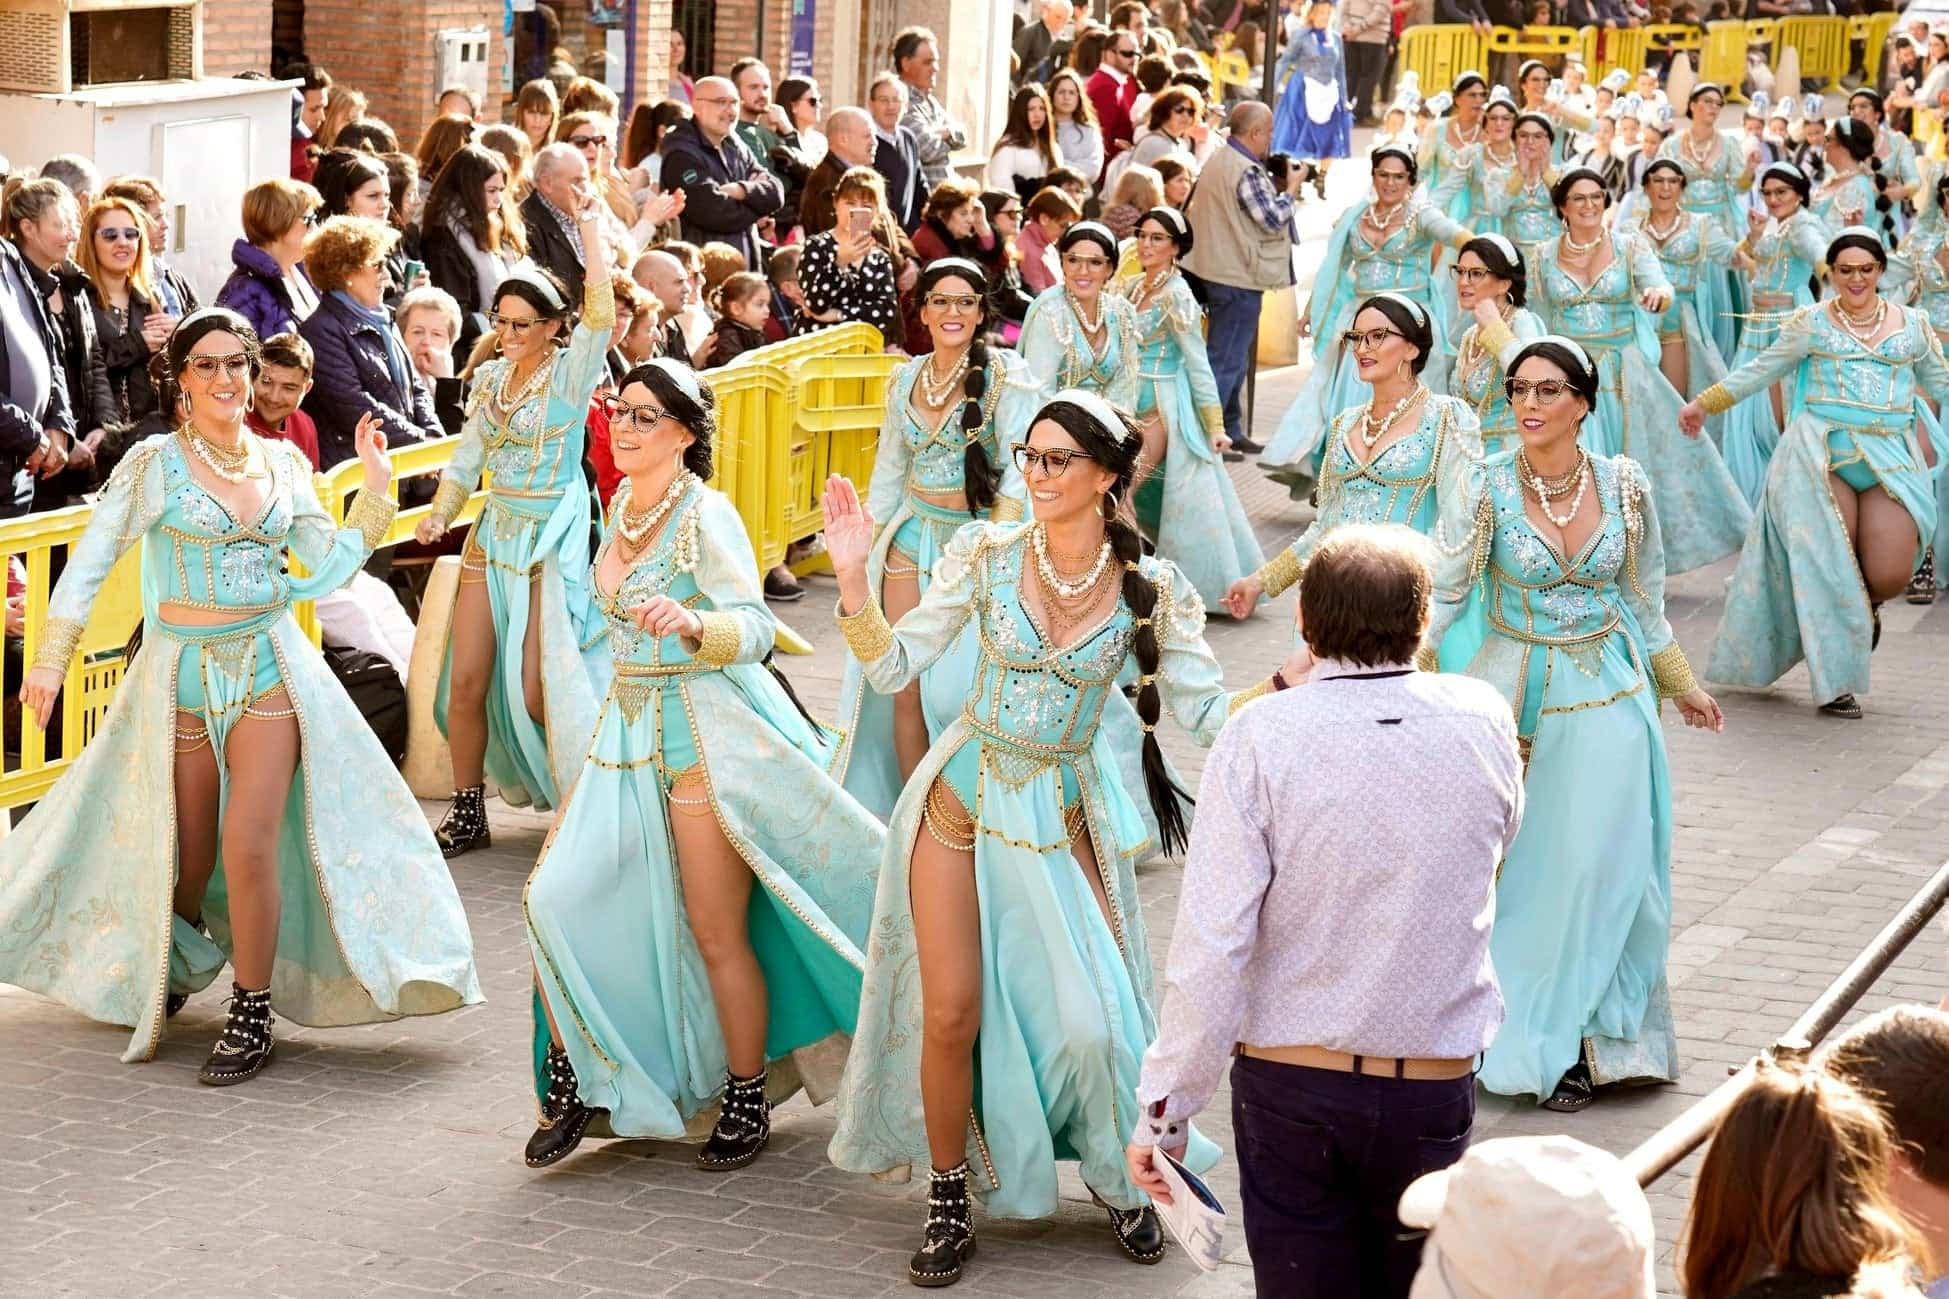 Carnaval de herencia 2020 ofertorio 71 - Selección de fotografías del Ofertorio del Carnaval de Herencia